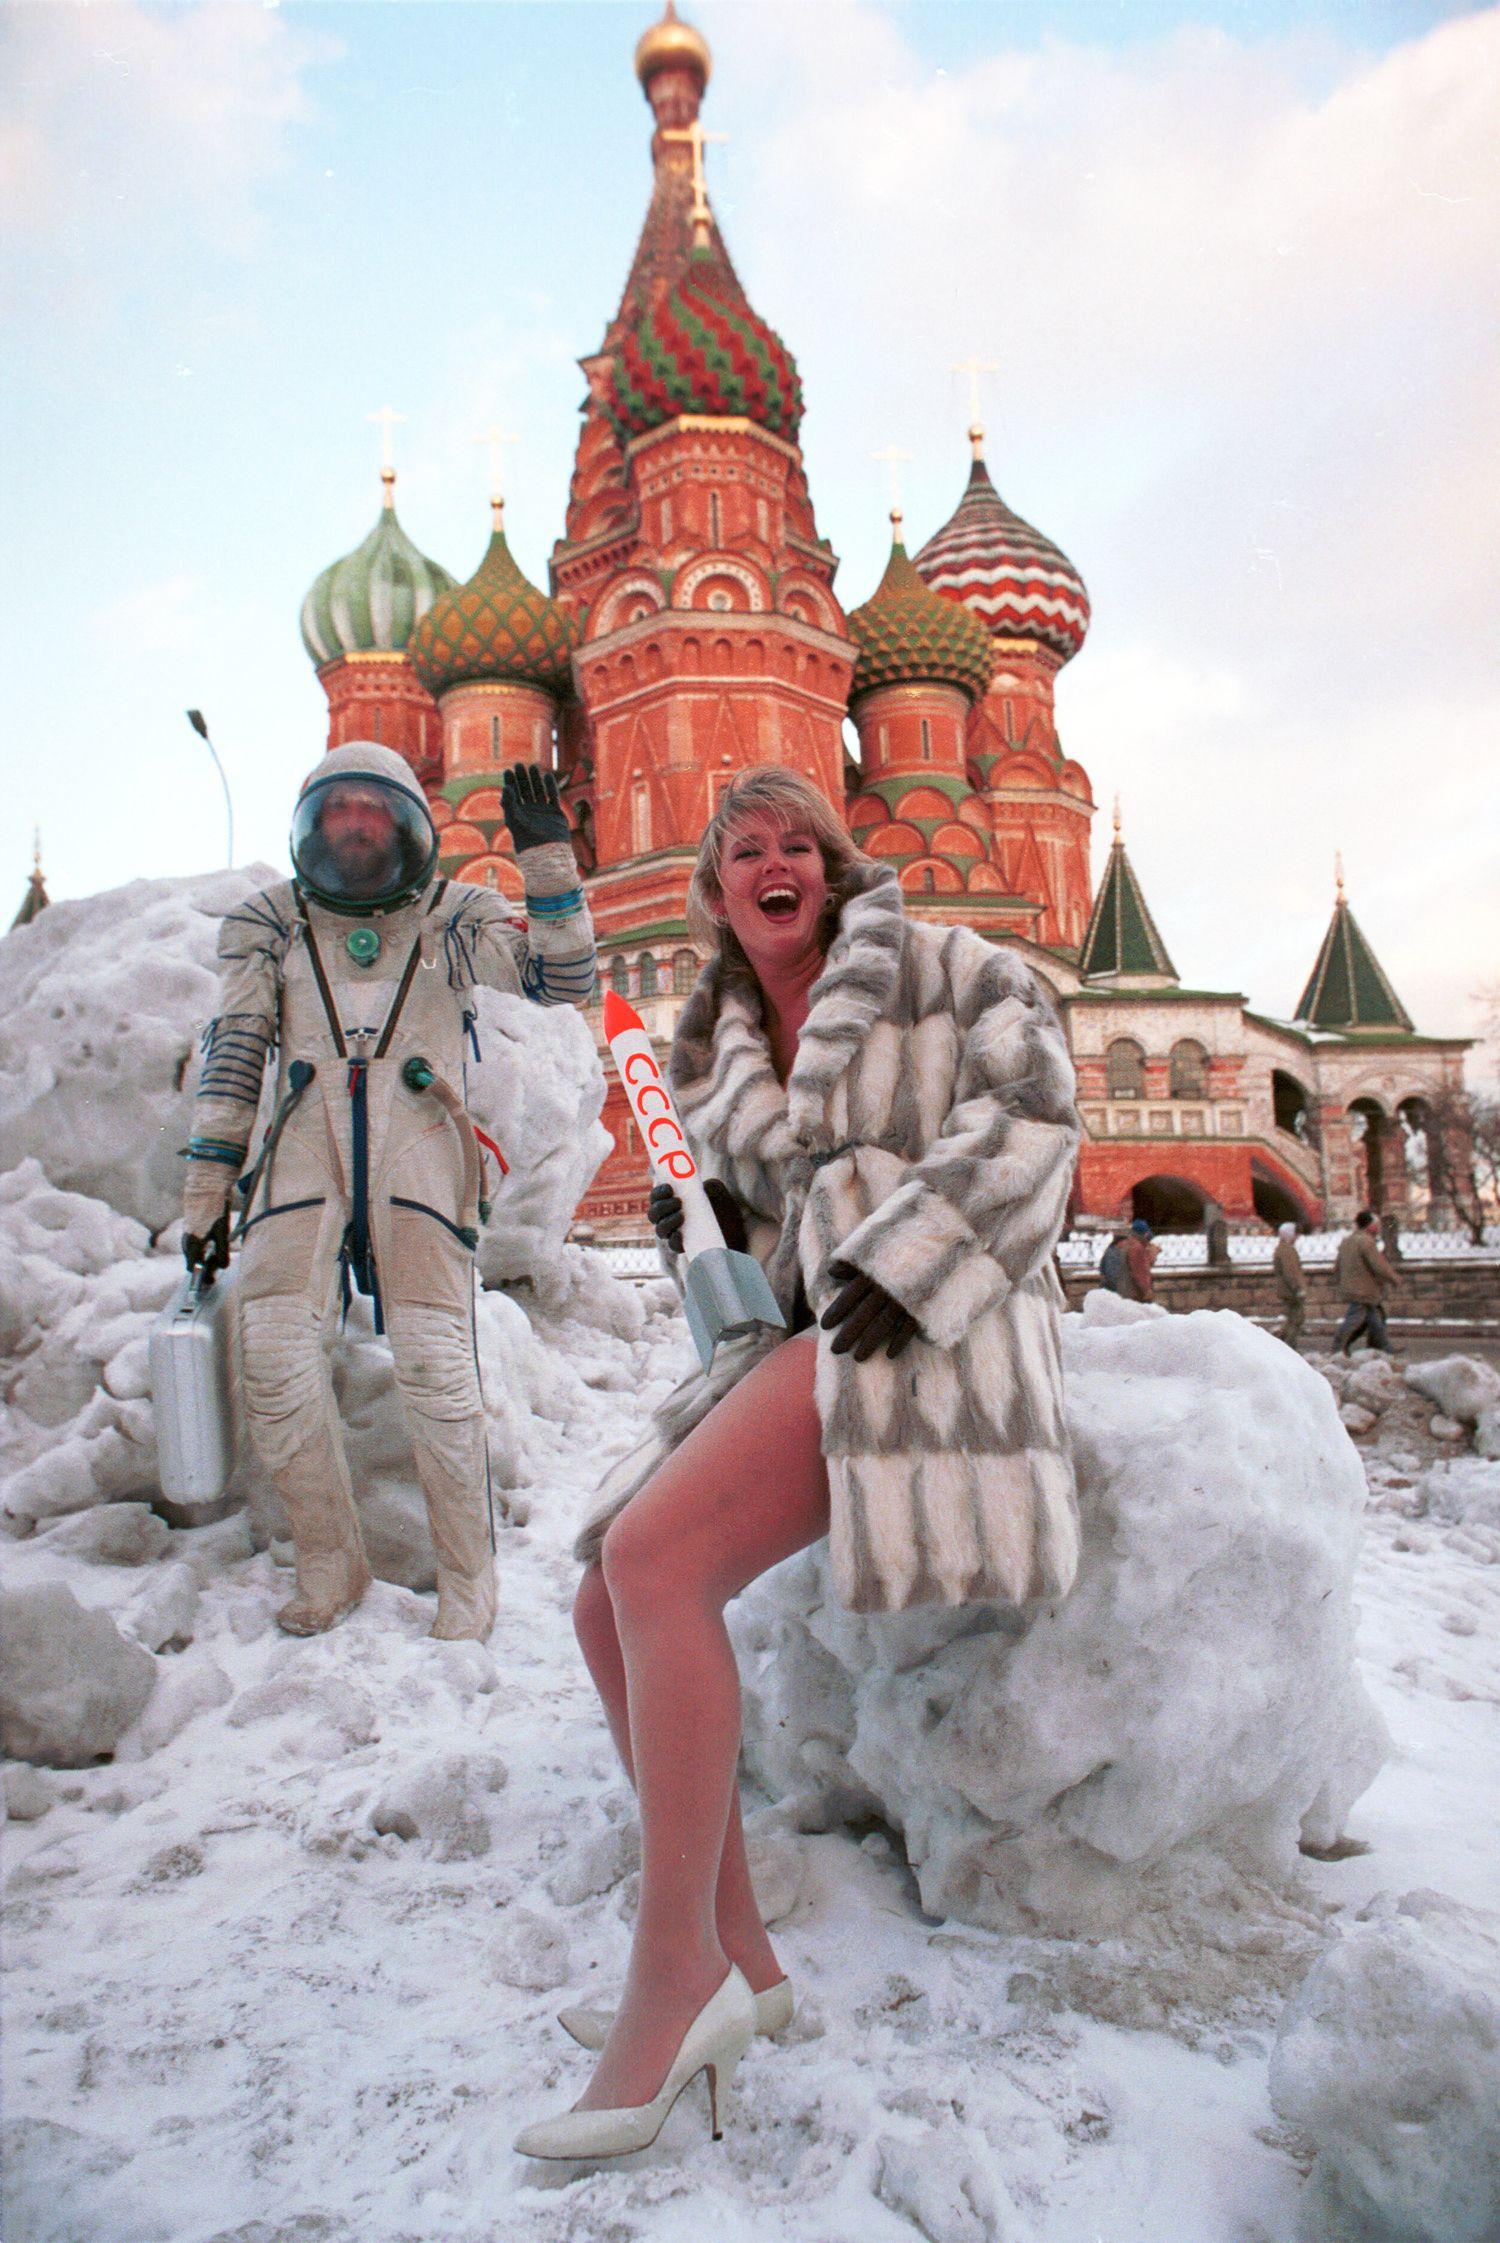 Съемки для мужского журнала «Андрей» на Красной площади, 1994 год, Москва